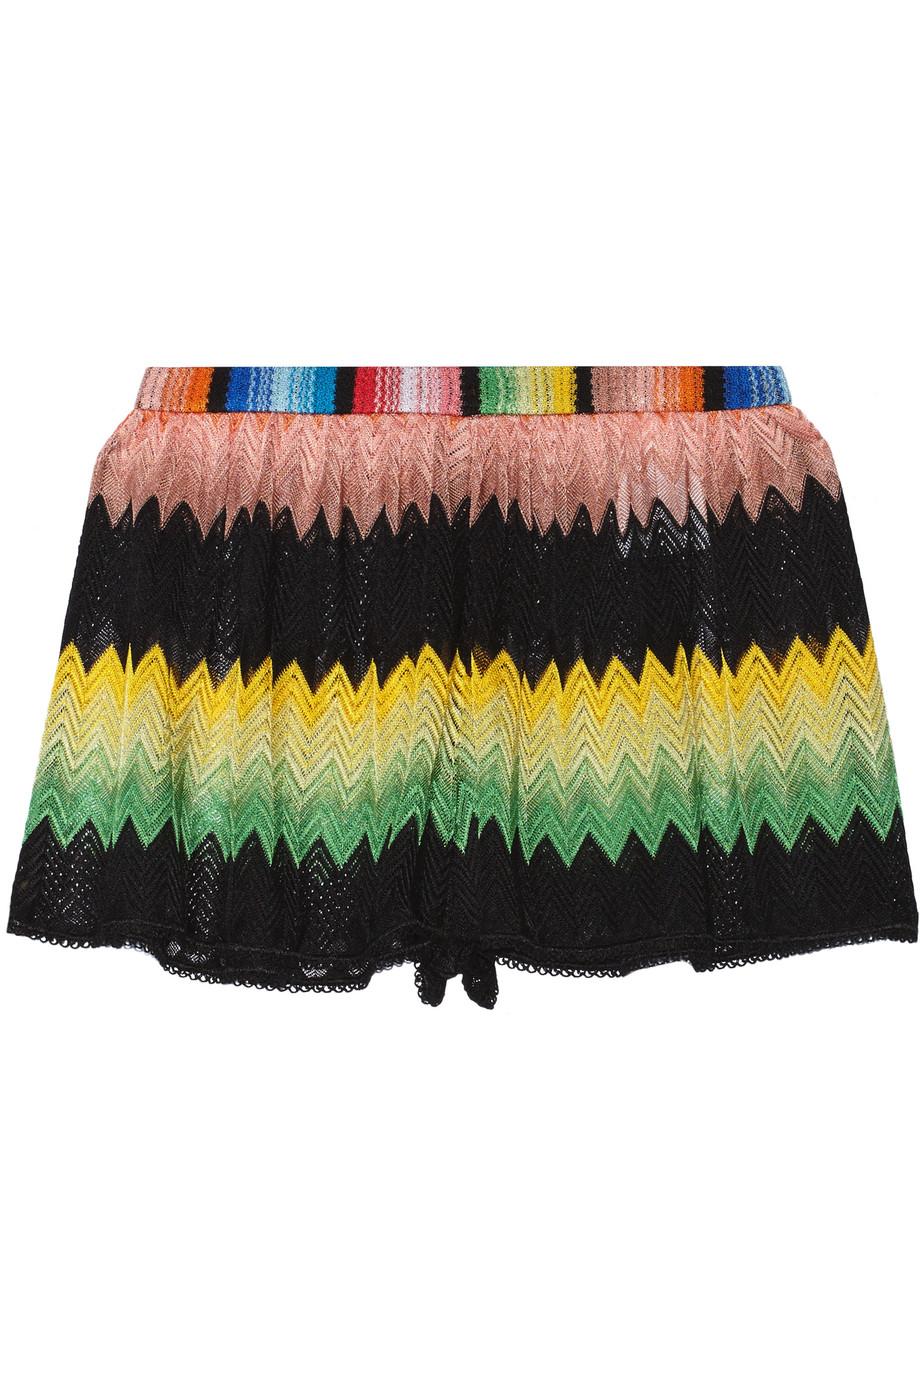 Missoni Mare Crochet-Knit Shorts, Black/Yellow, Women's, Size: 44